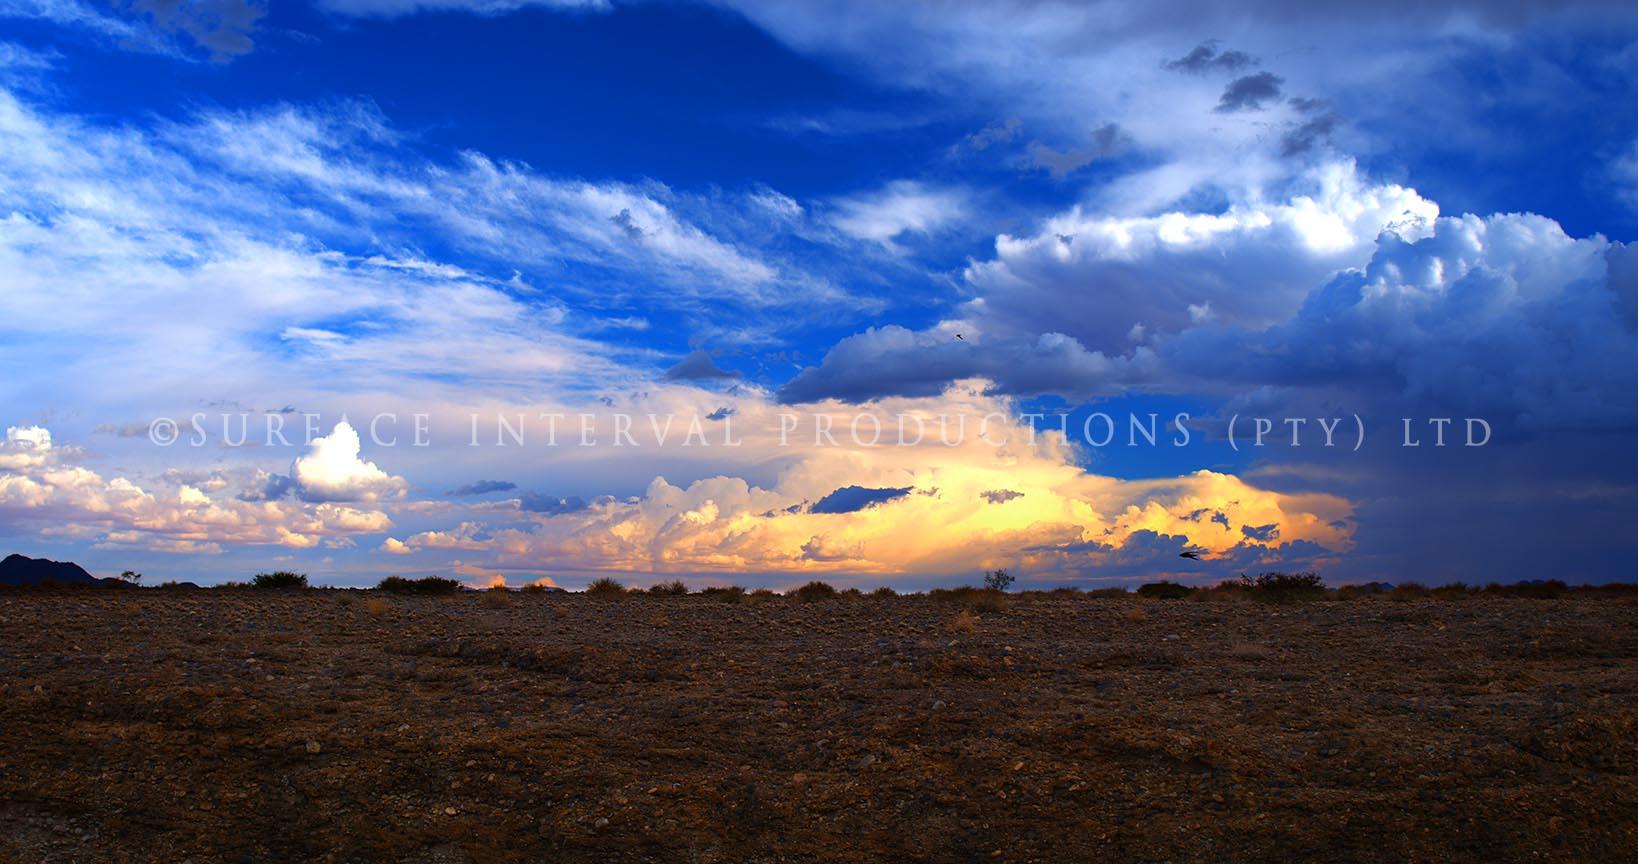 Sunset-rise 19.jpg